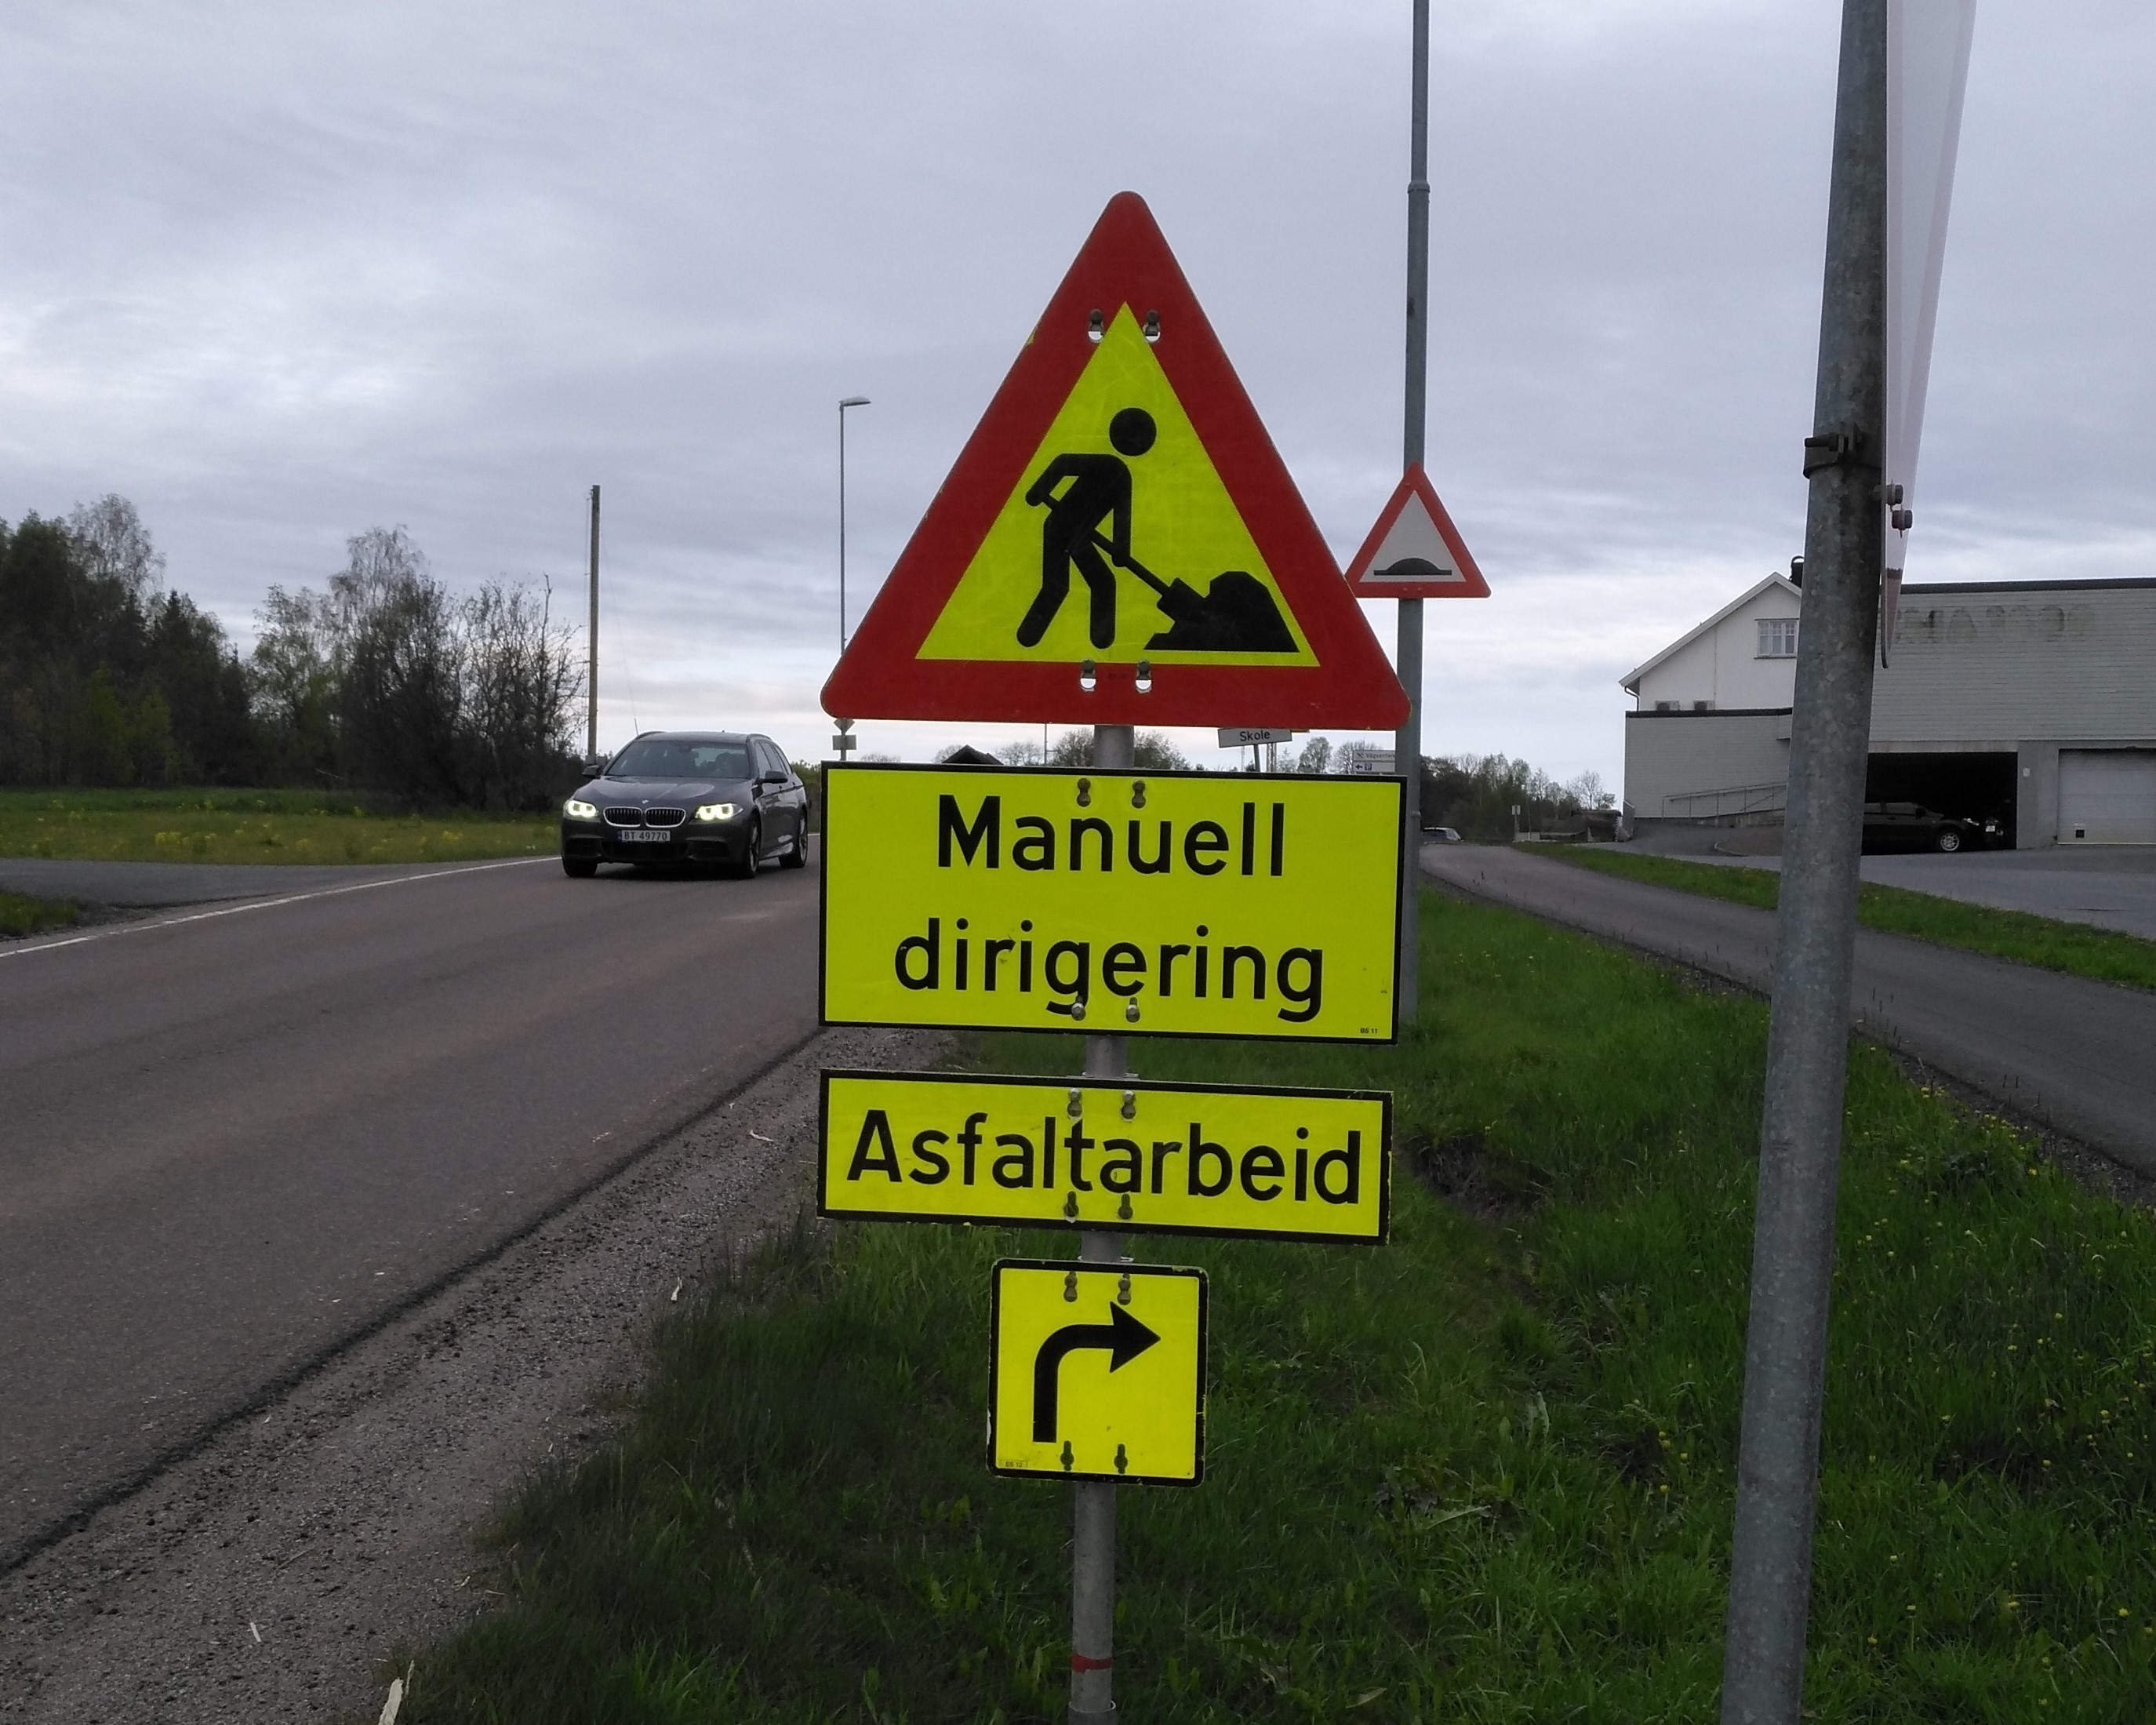 Asfaltarbeid - manuell dirigering - Aksel I. Edgar-Lund CRPPD